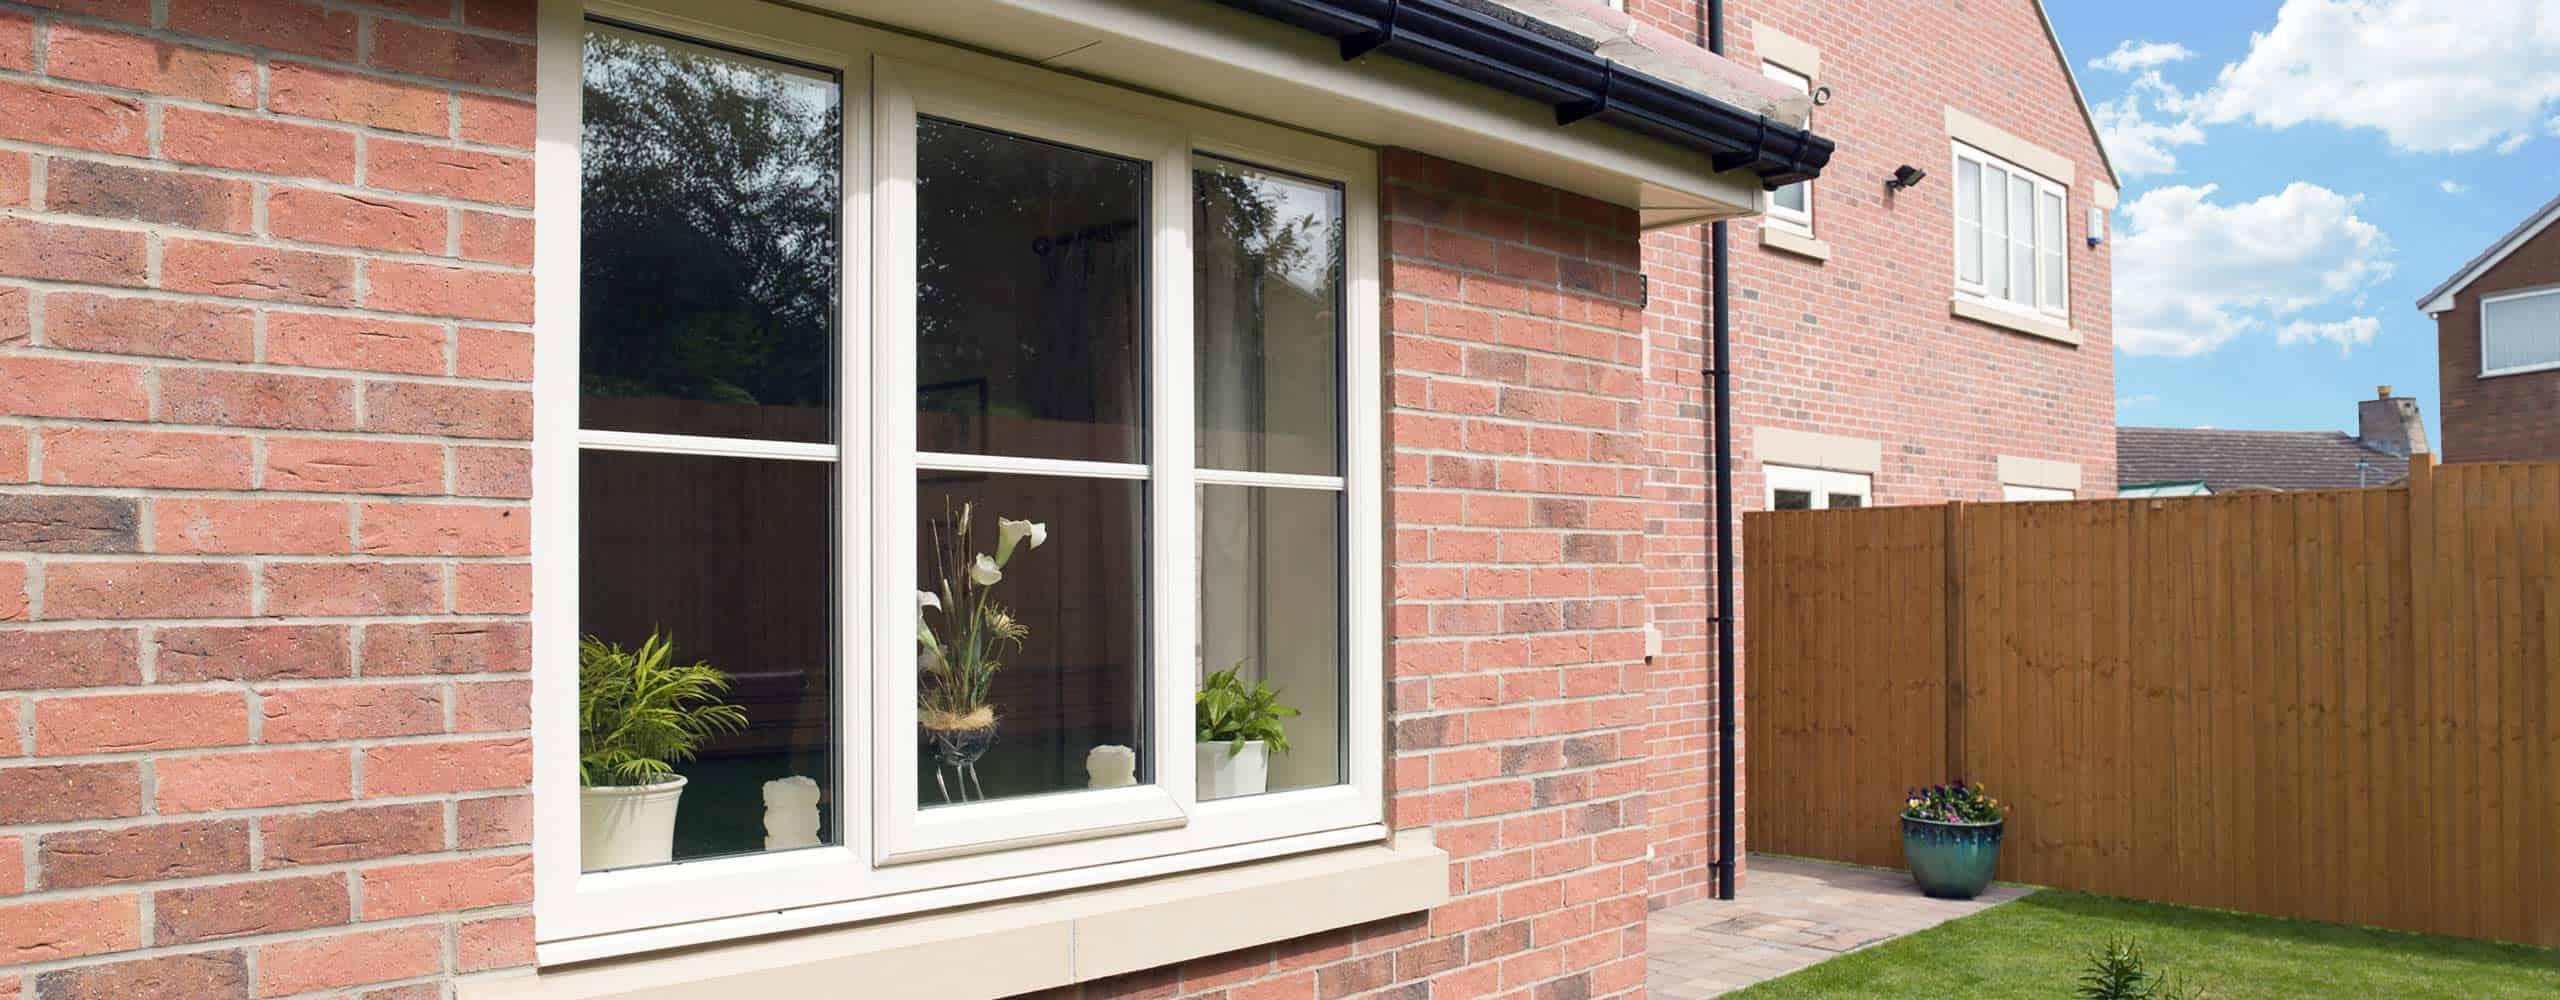 Double glazing witham double glazing prices upvc windows for Upvc double glazing